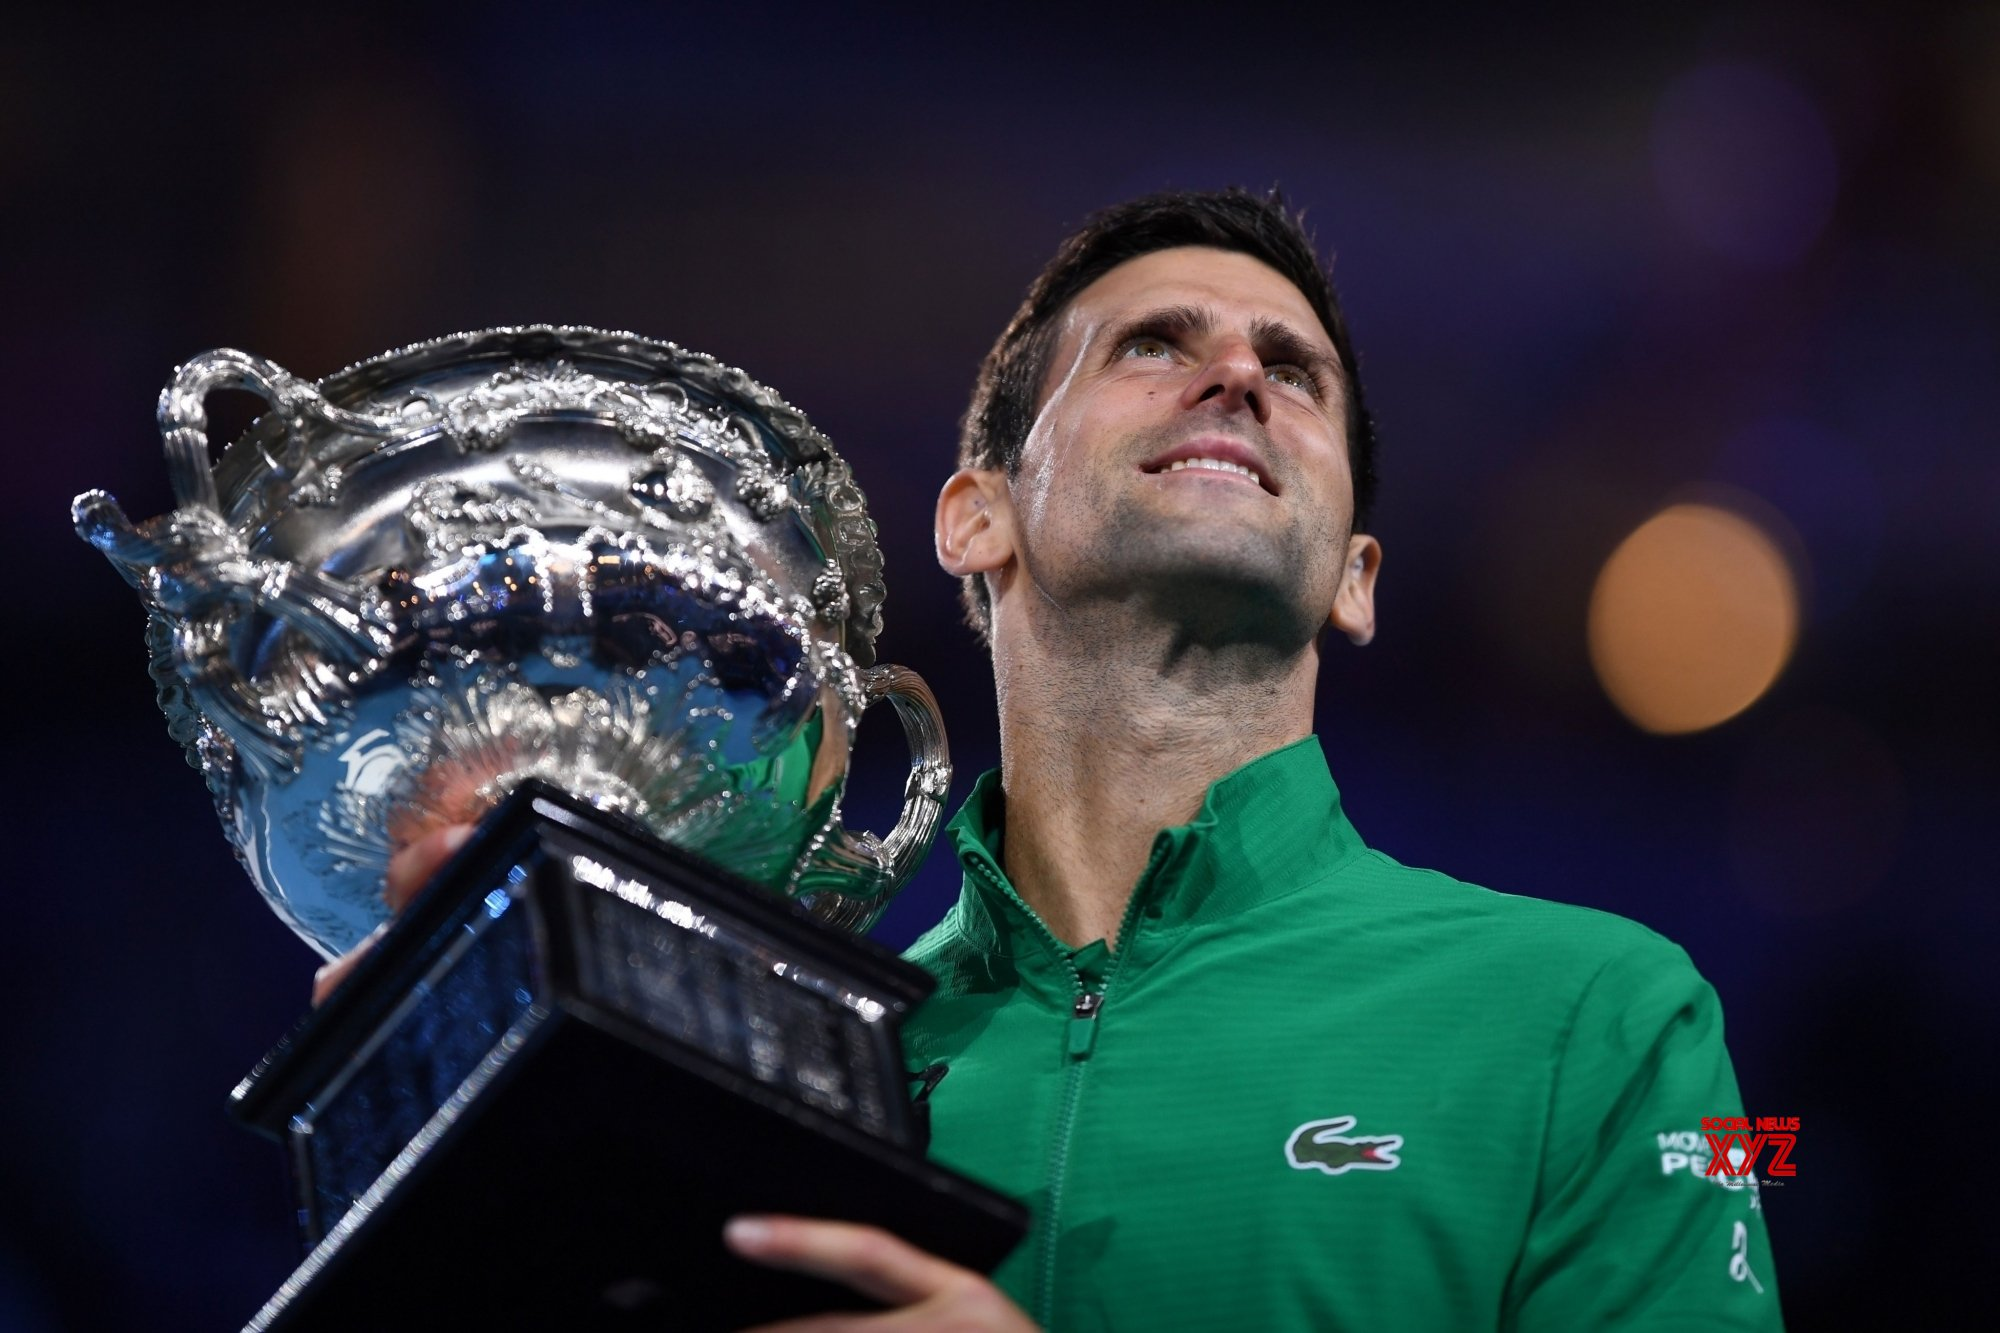 Djokovic to host tennis tour in Balkan countries, Thiem, Dimitrov sign up